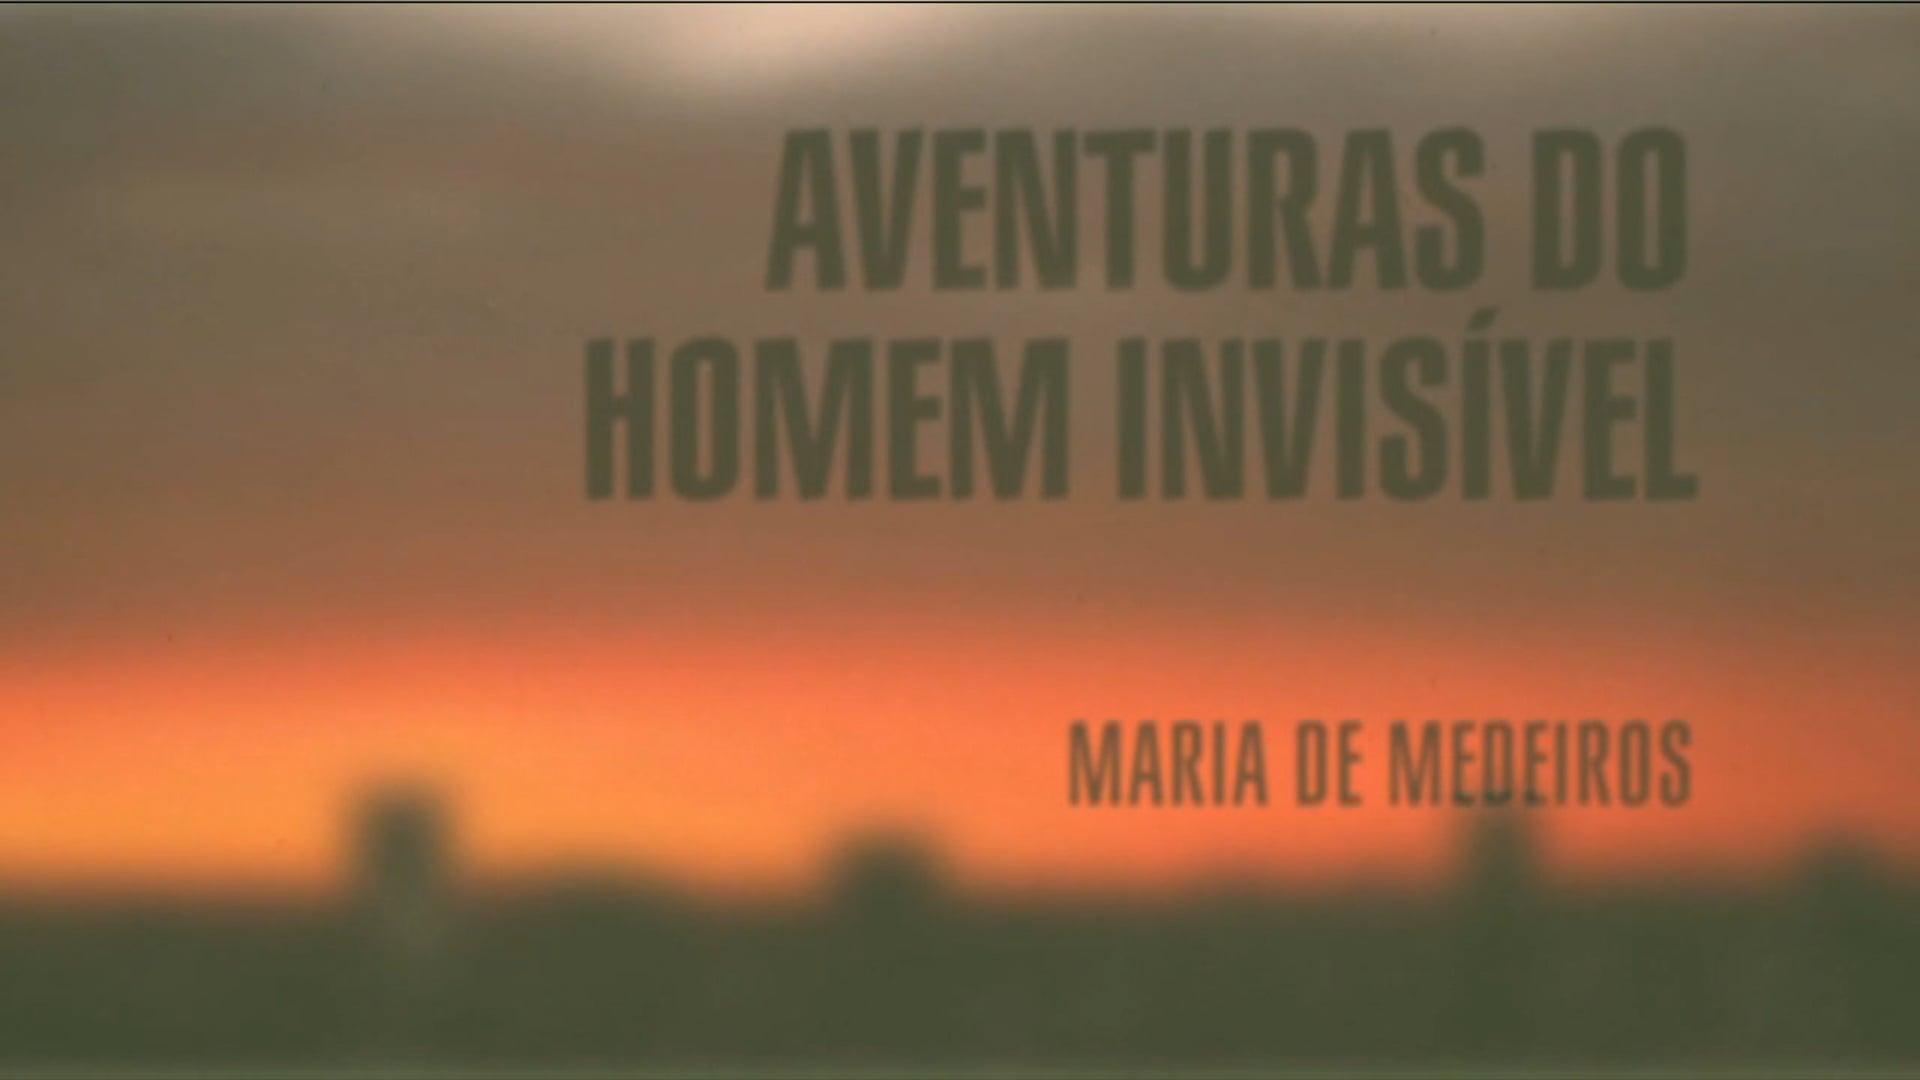 Aventuras do Homem Invisível (2012)